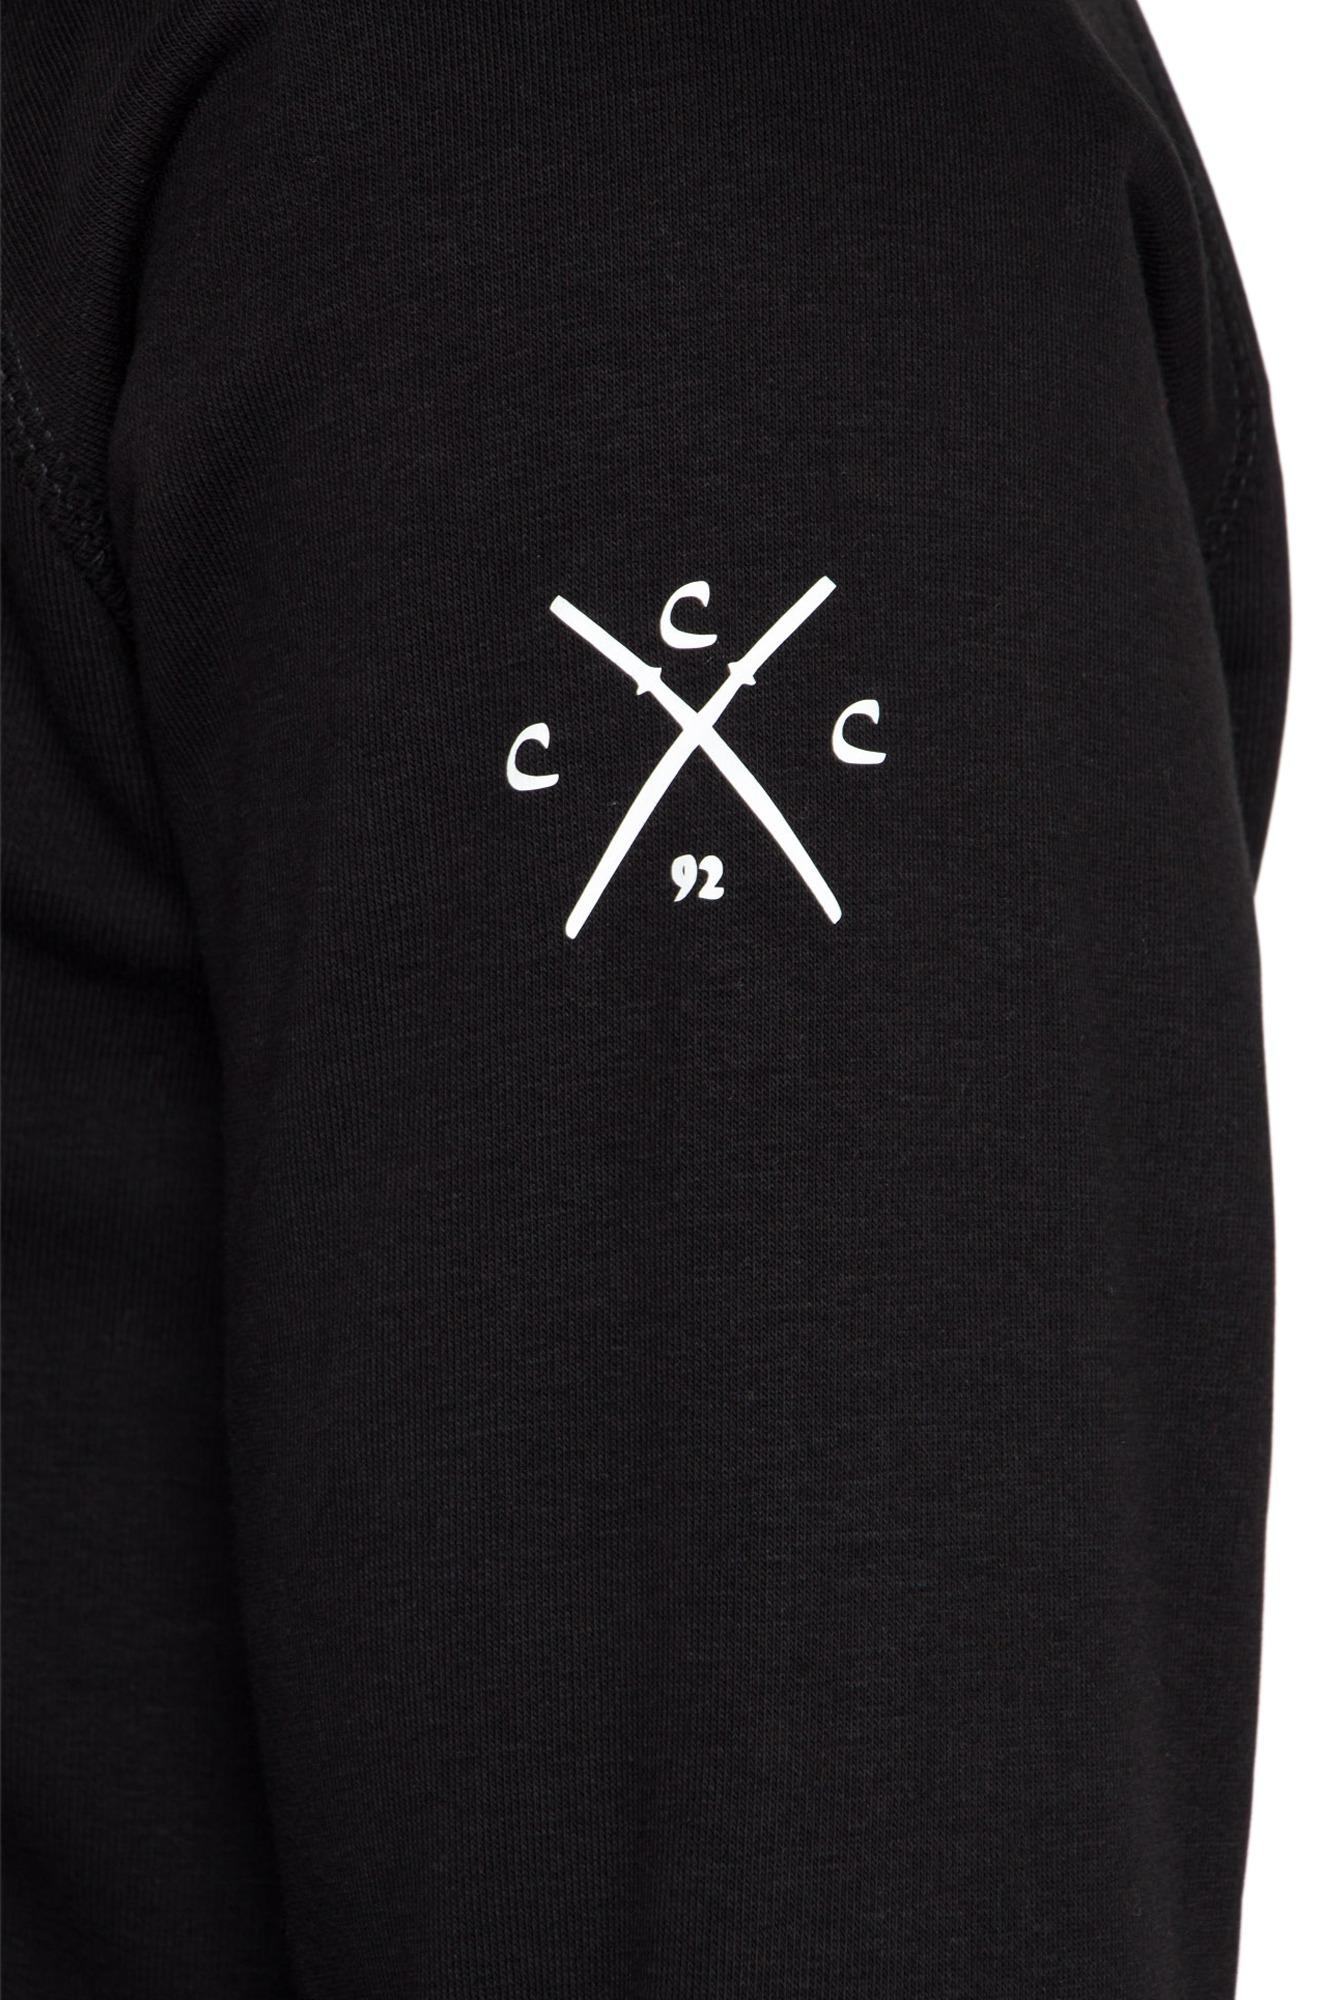 CORPION big sweater black